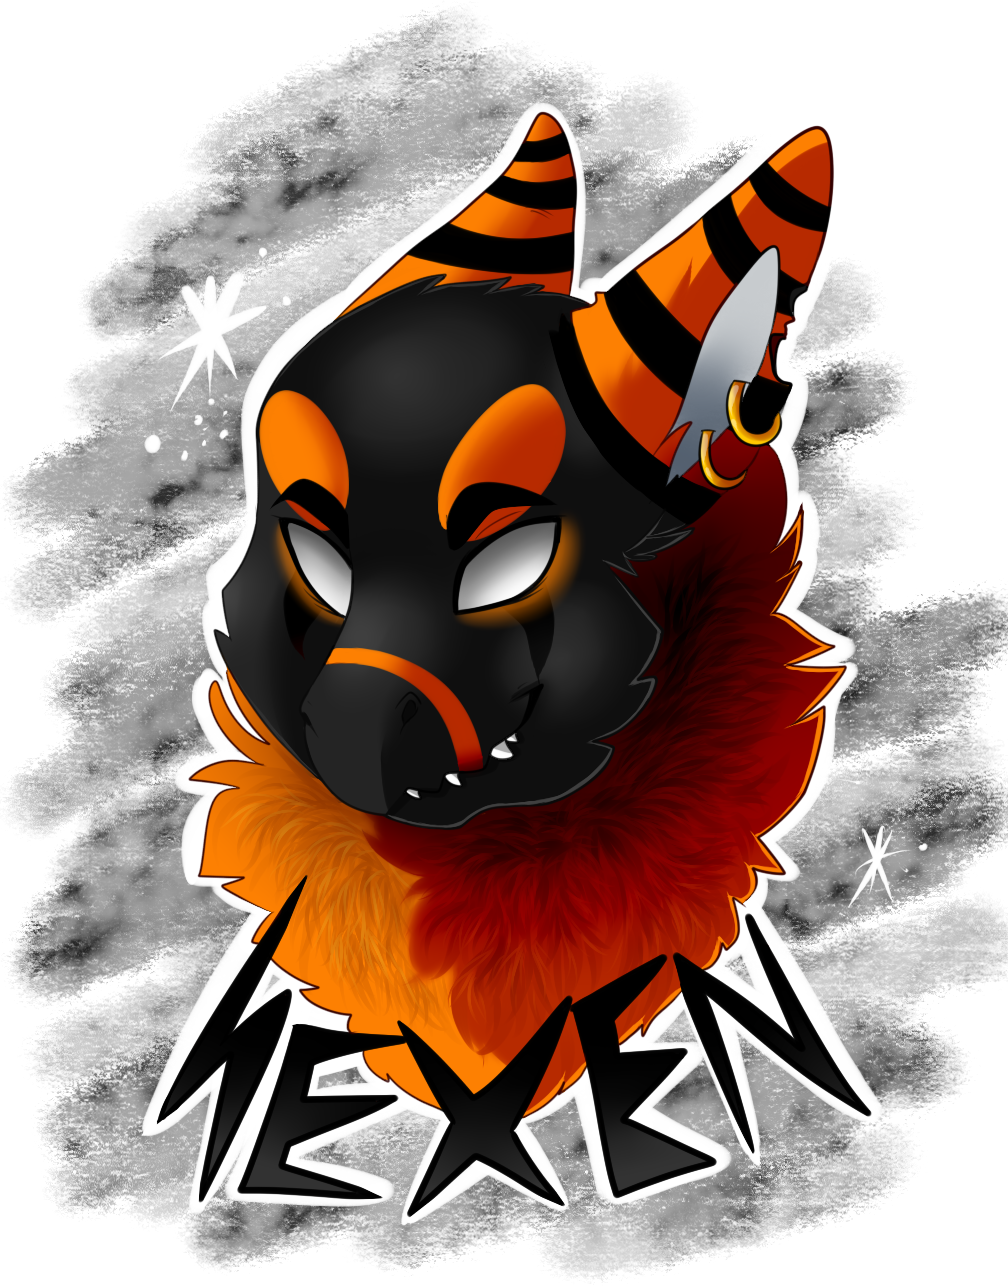 Hexen Headshot commission